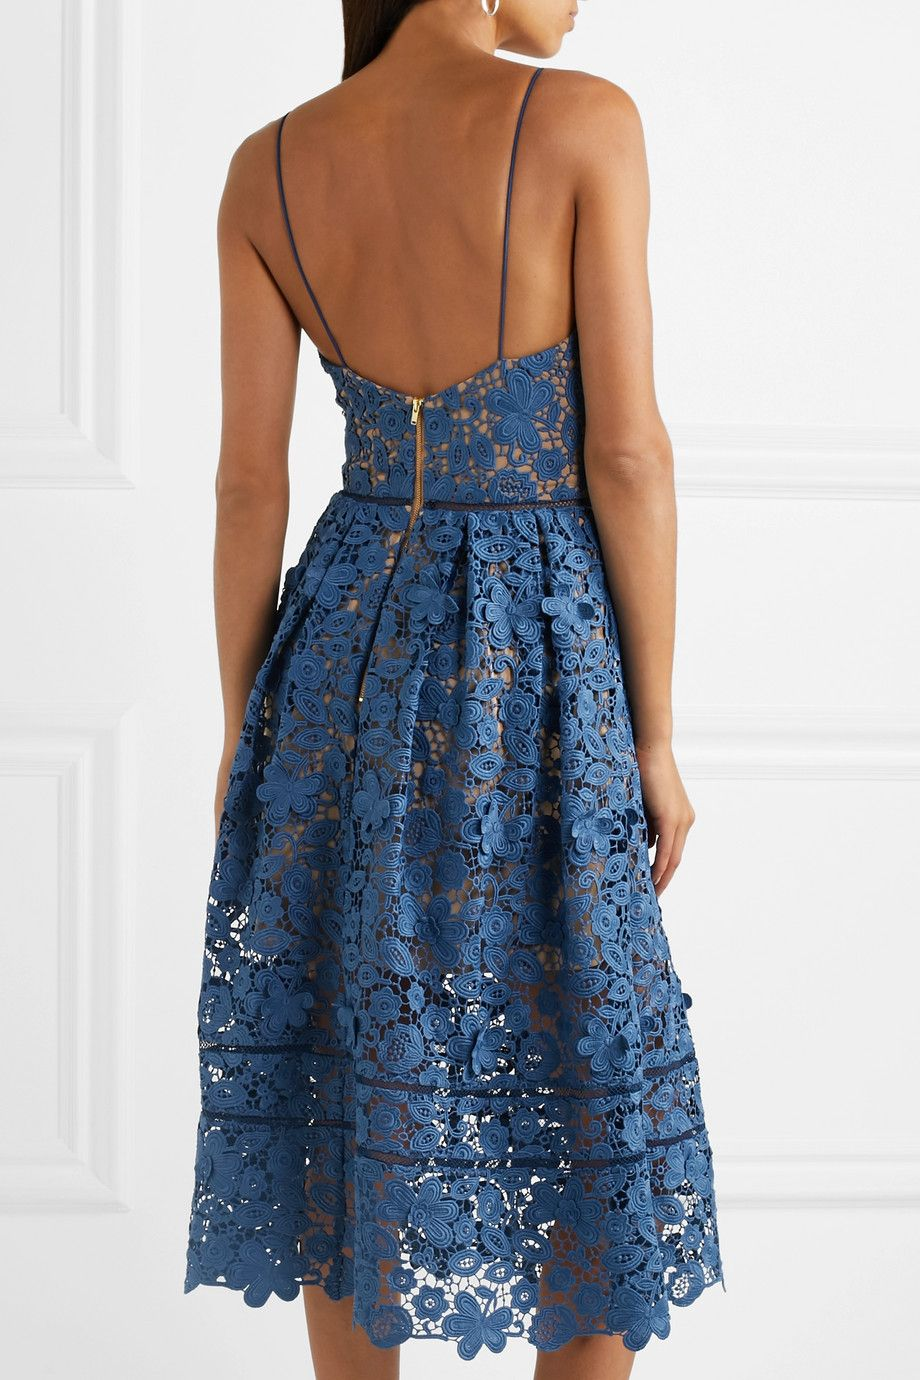 37+ Azaelea lace midi dress inspirations